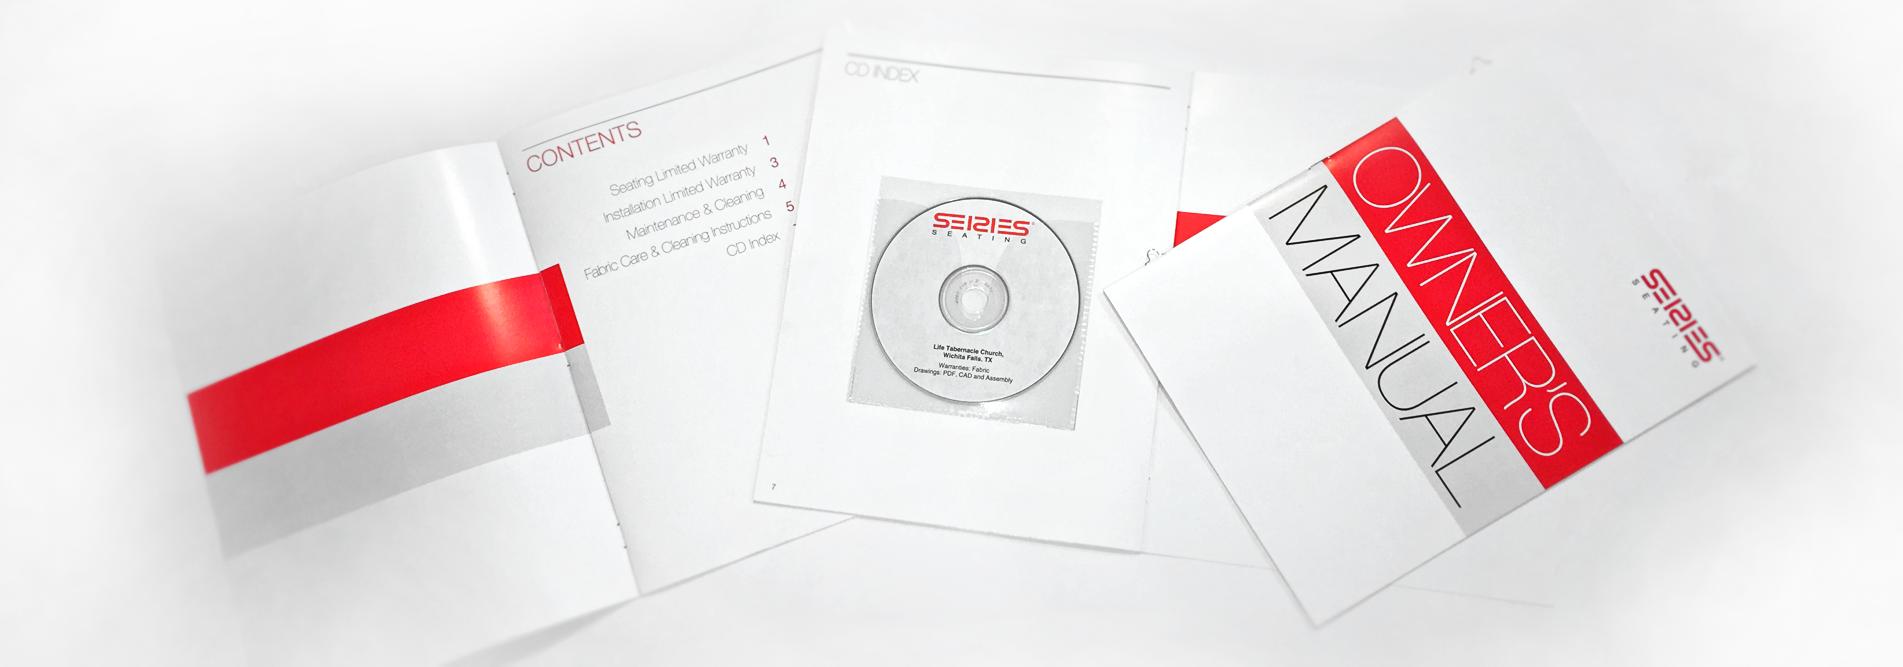 Honda crv owners manual | ebay.